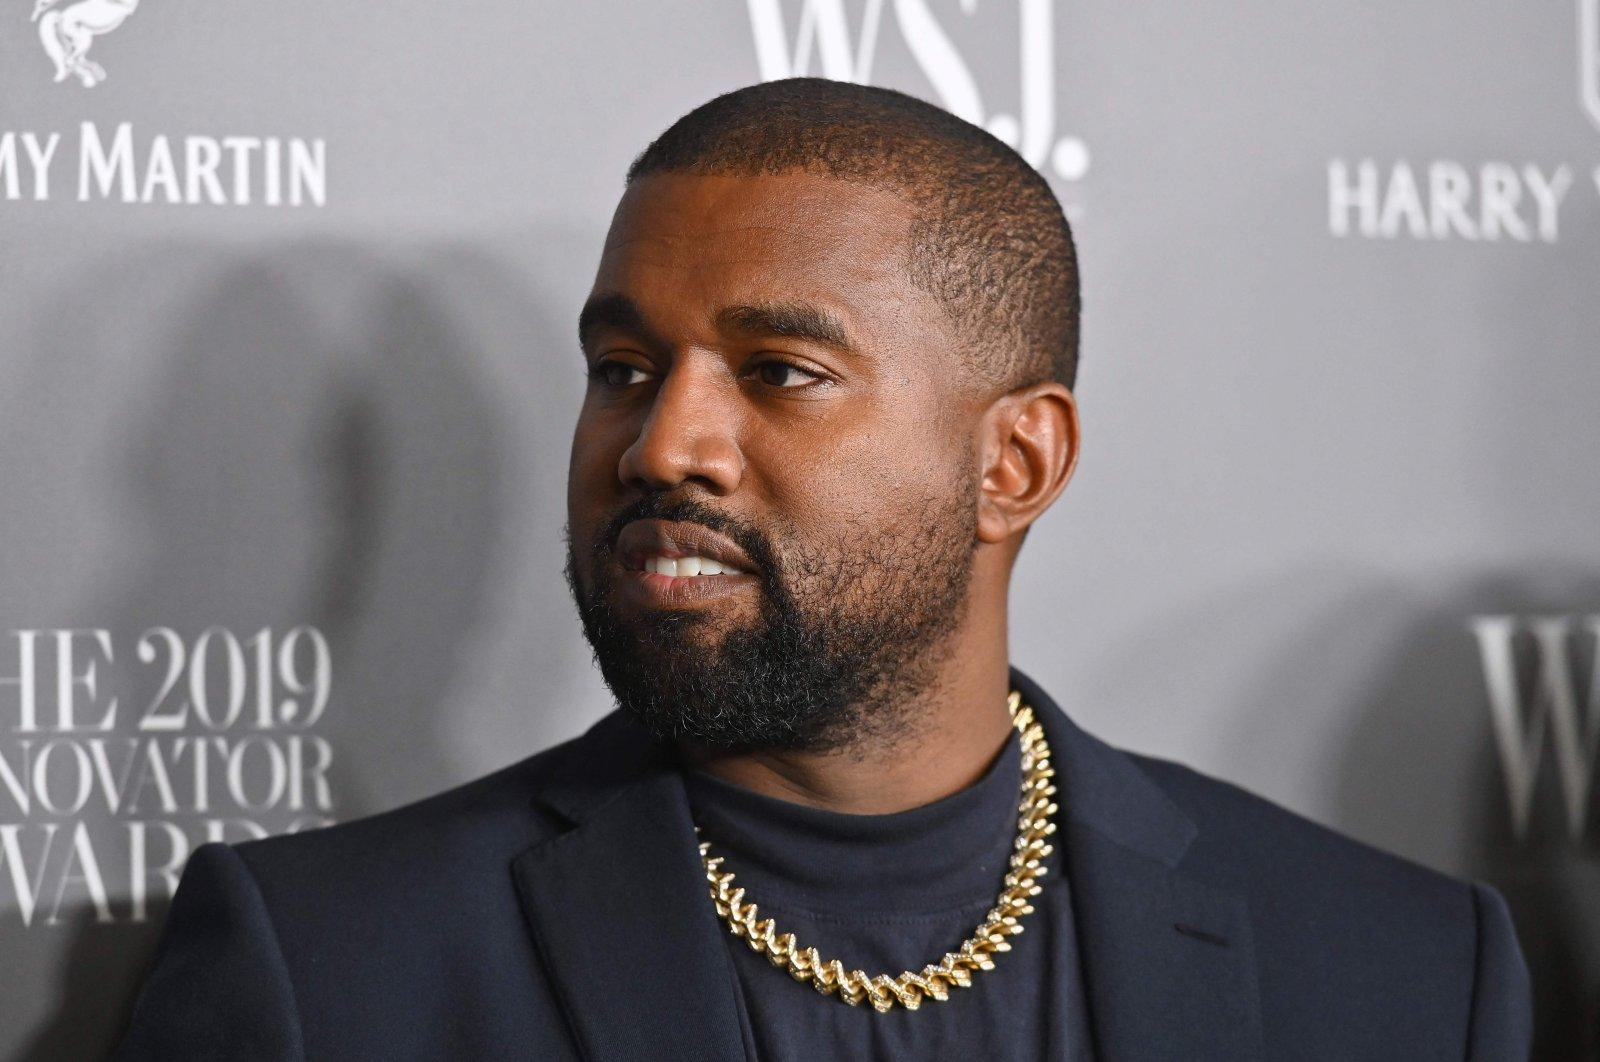 U.S. rapper Kanye West attends the WSJ Magazine 2019 Innovator Awards at MOMA on Nov. 6, 2019 in New York City. (AFP)